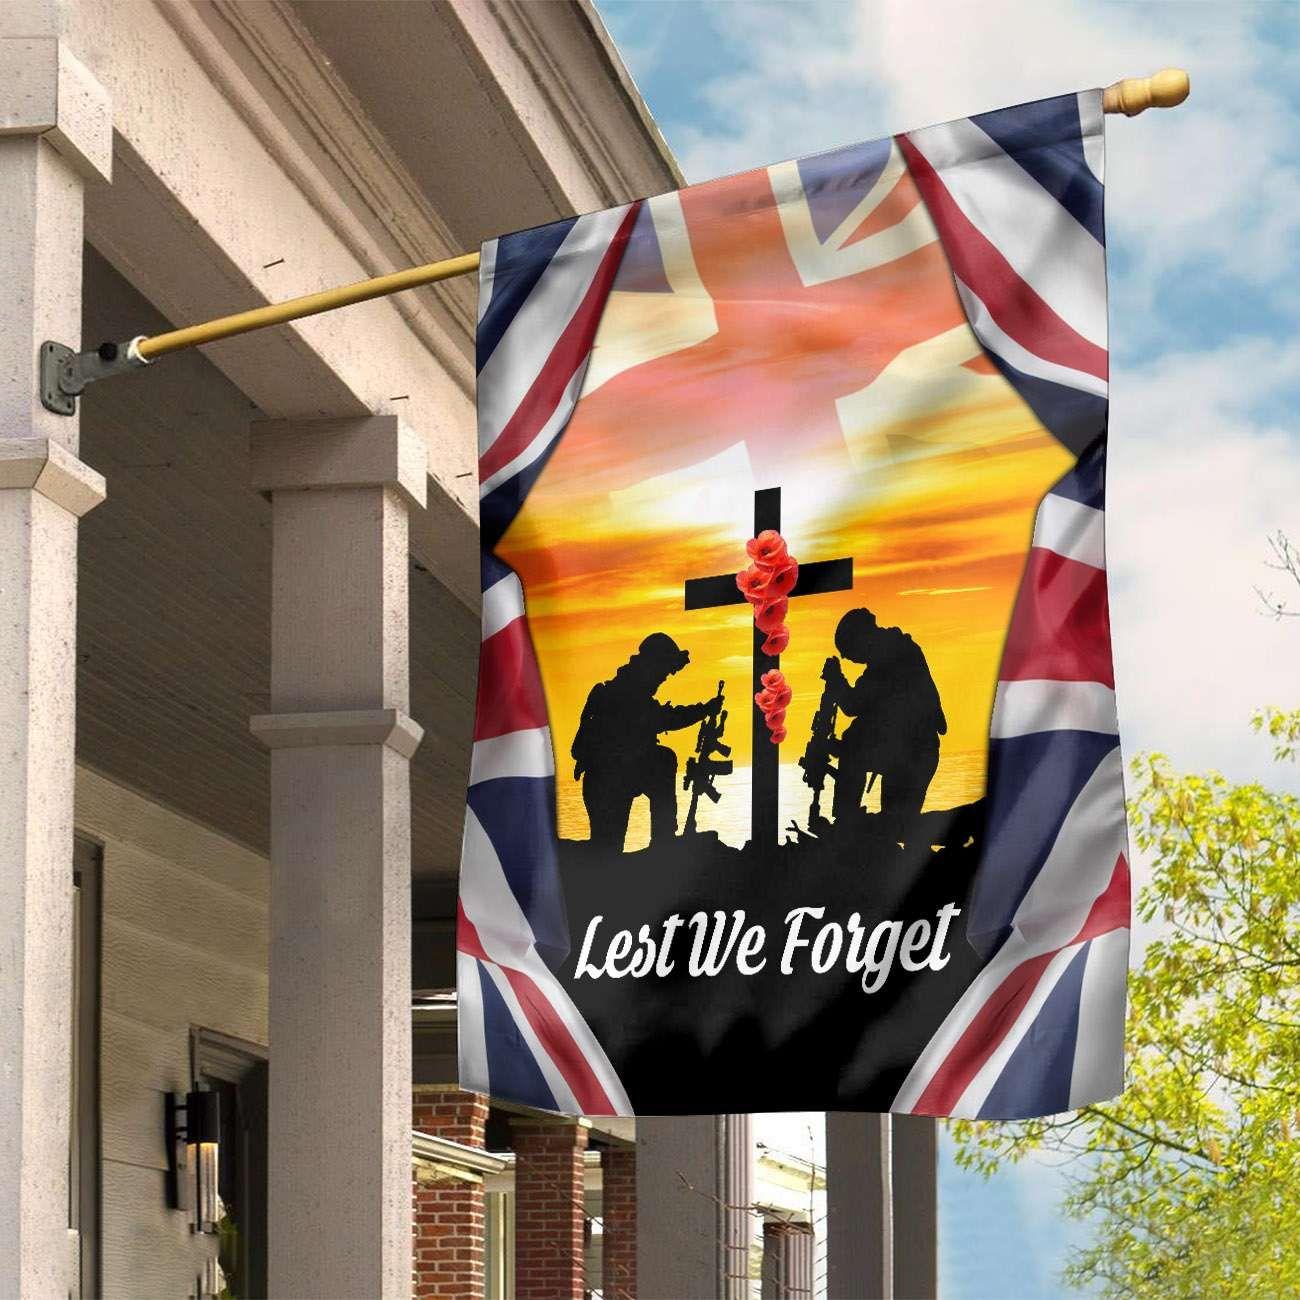 Lest We Forget UK Remembrance Day flag